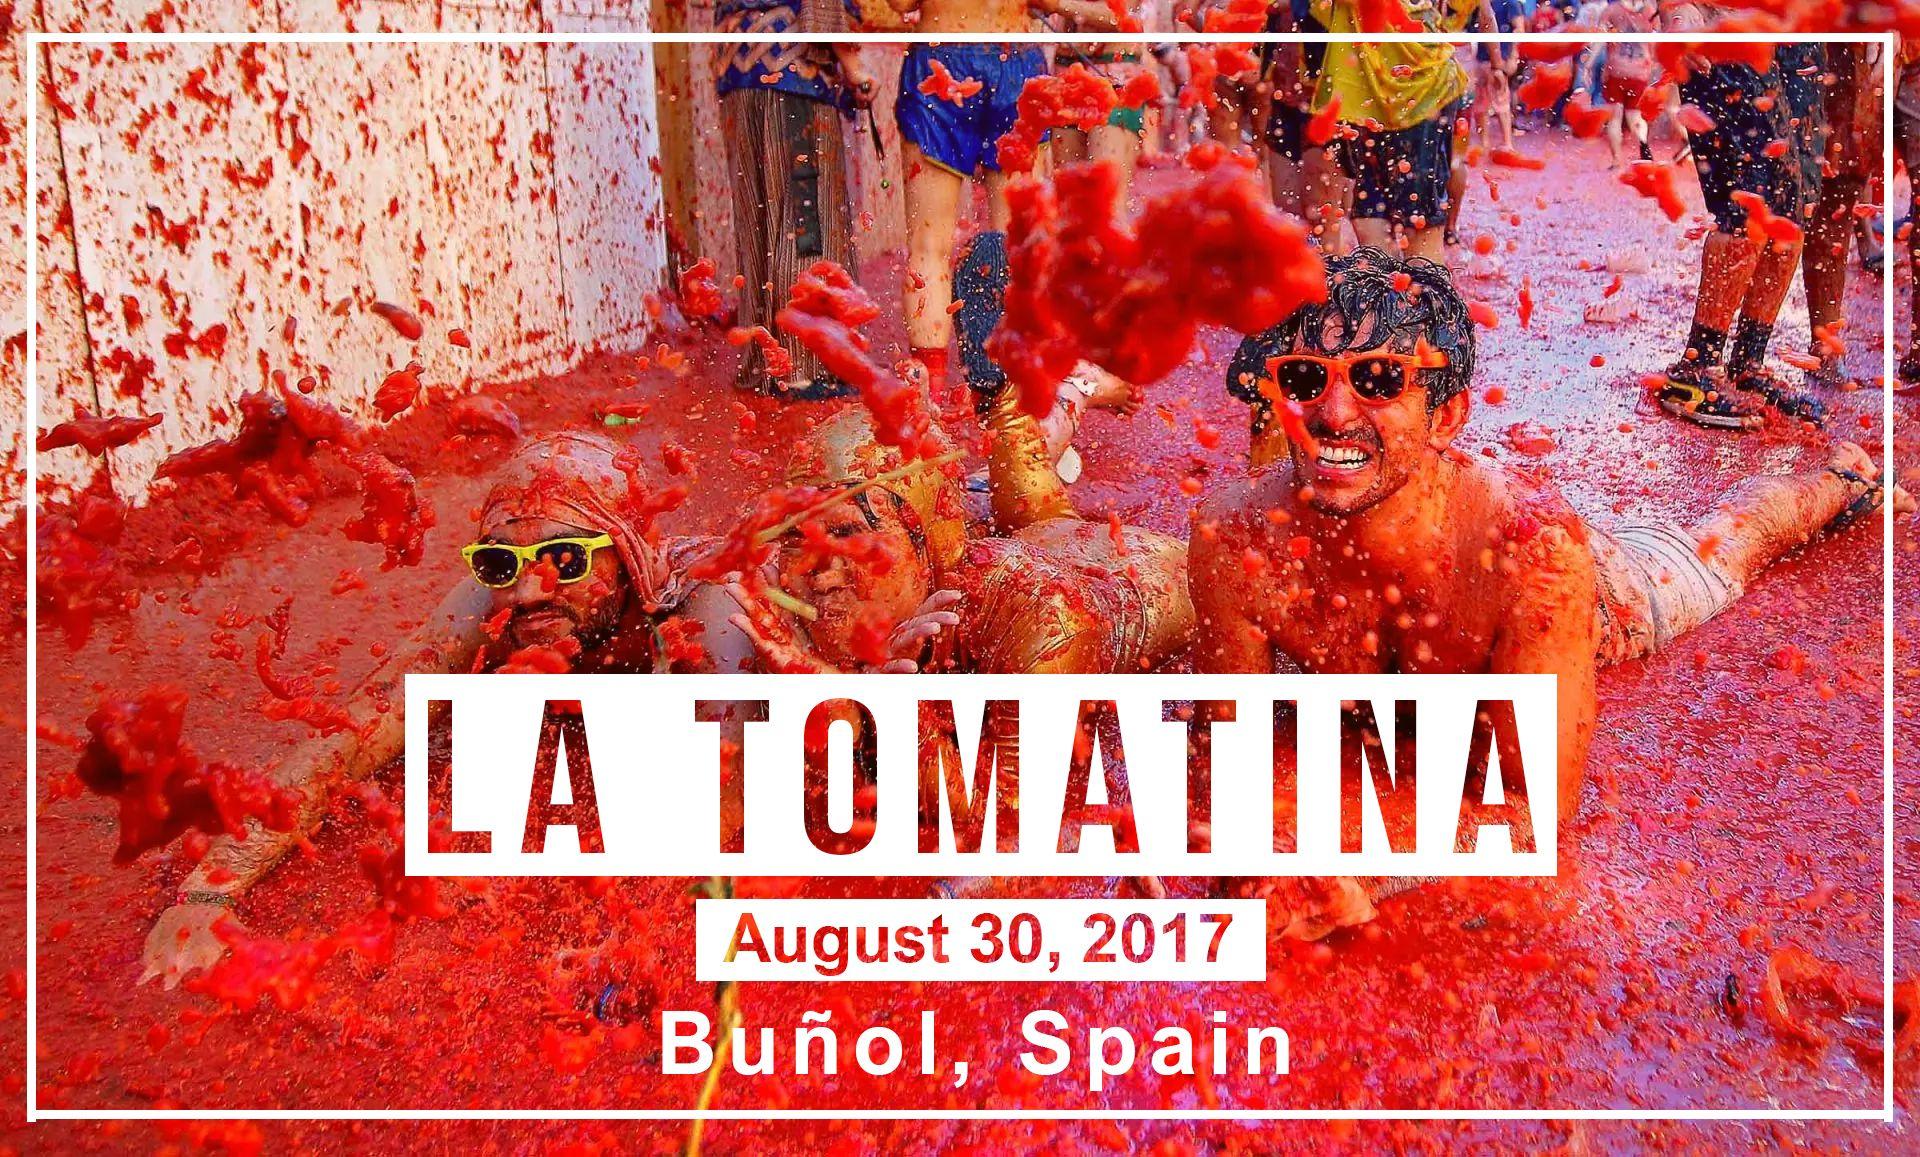 La Tomatina August 30th In Bunol Latomatina Bunol Spain Tomatofestival Globelink Travel